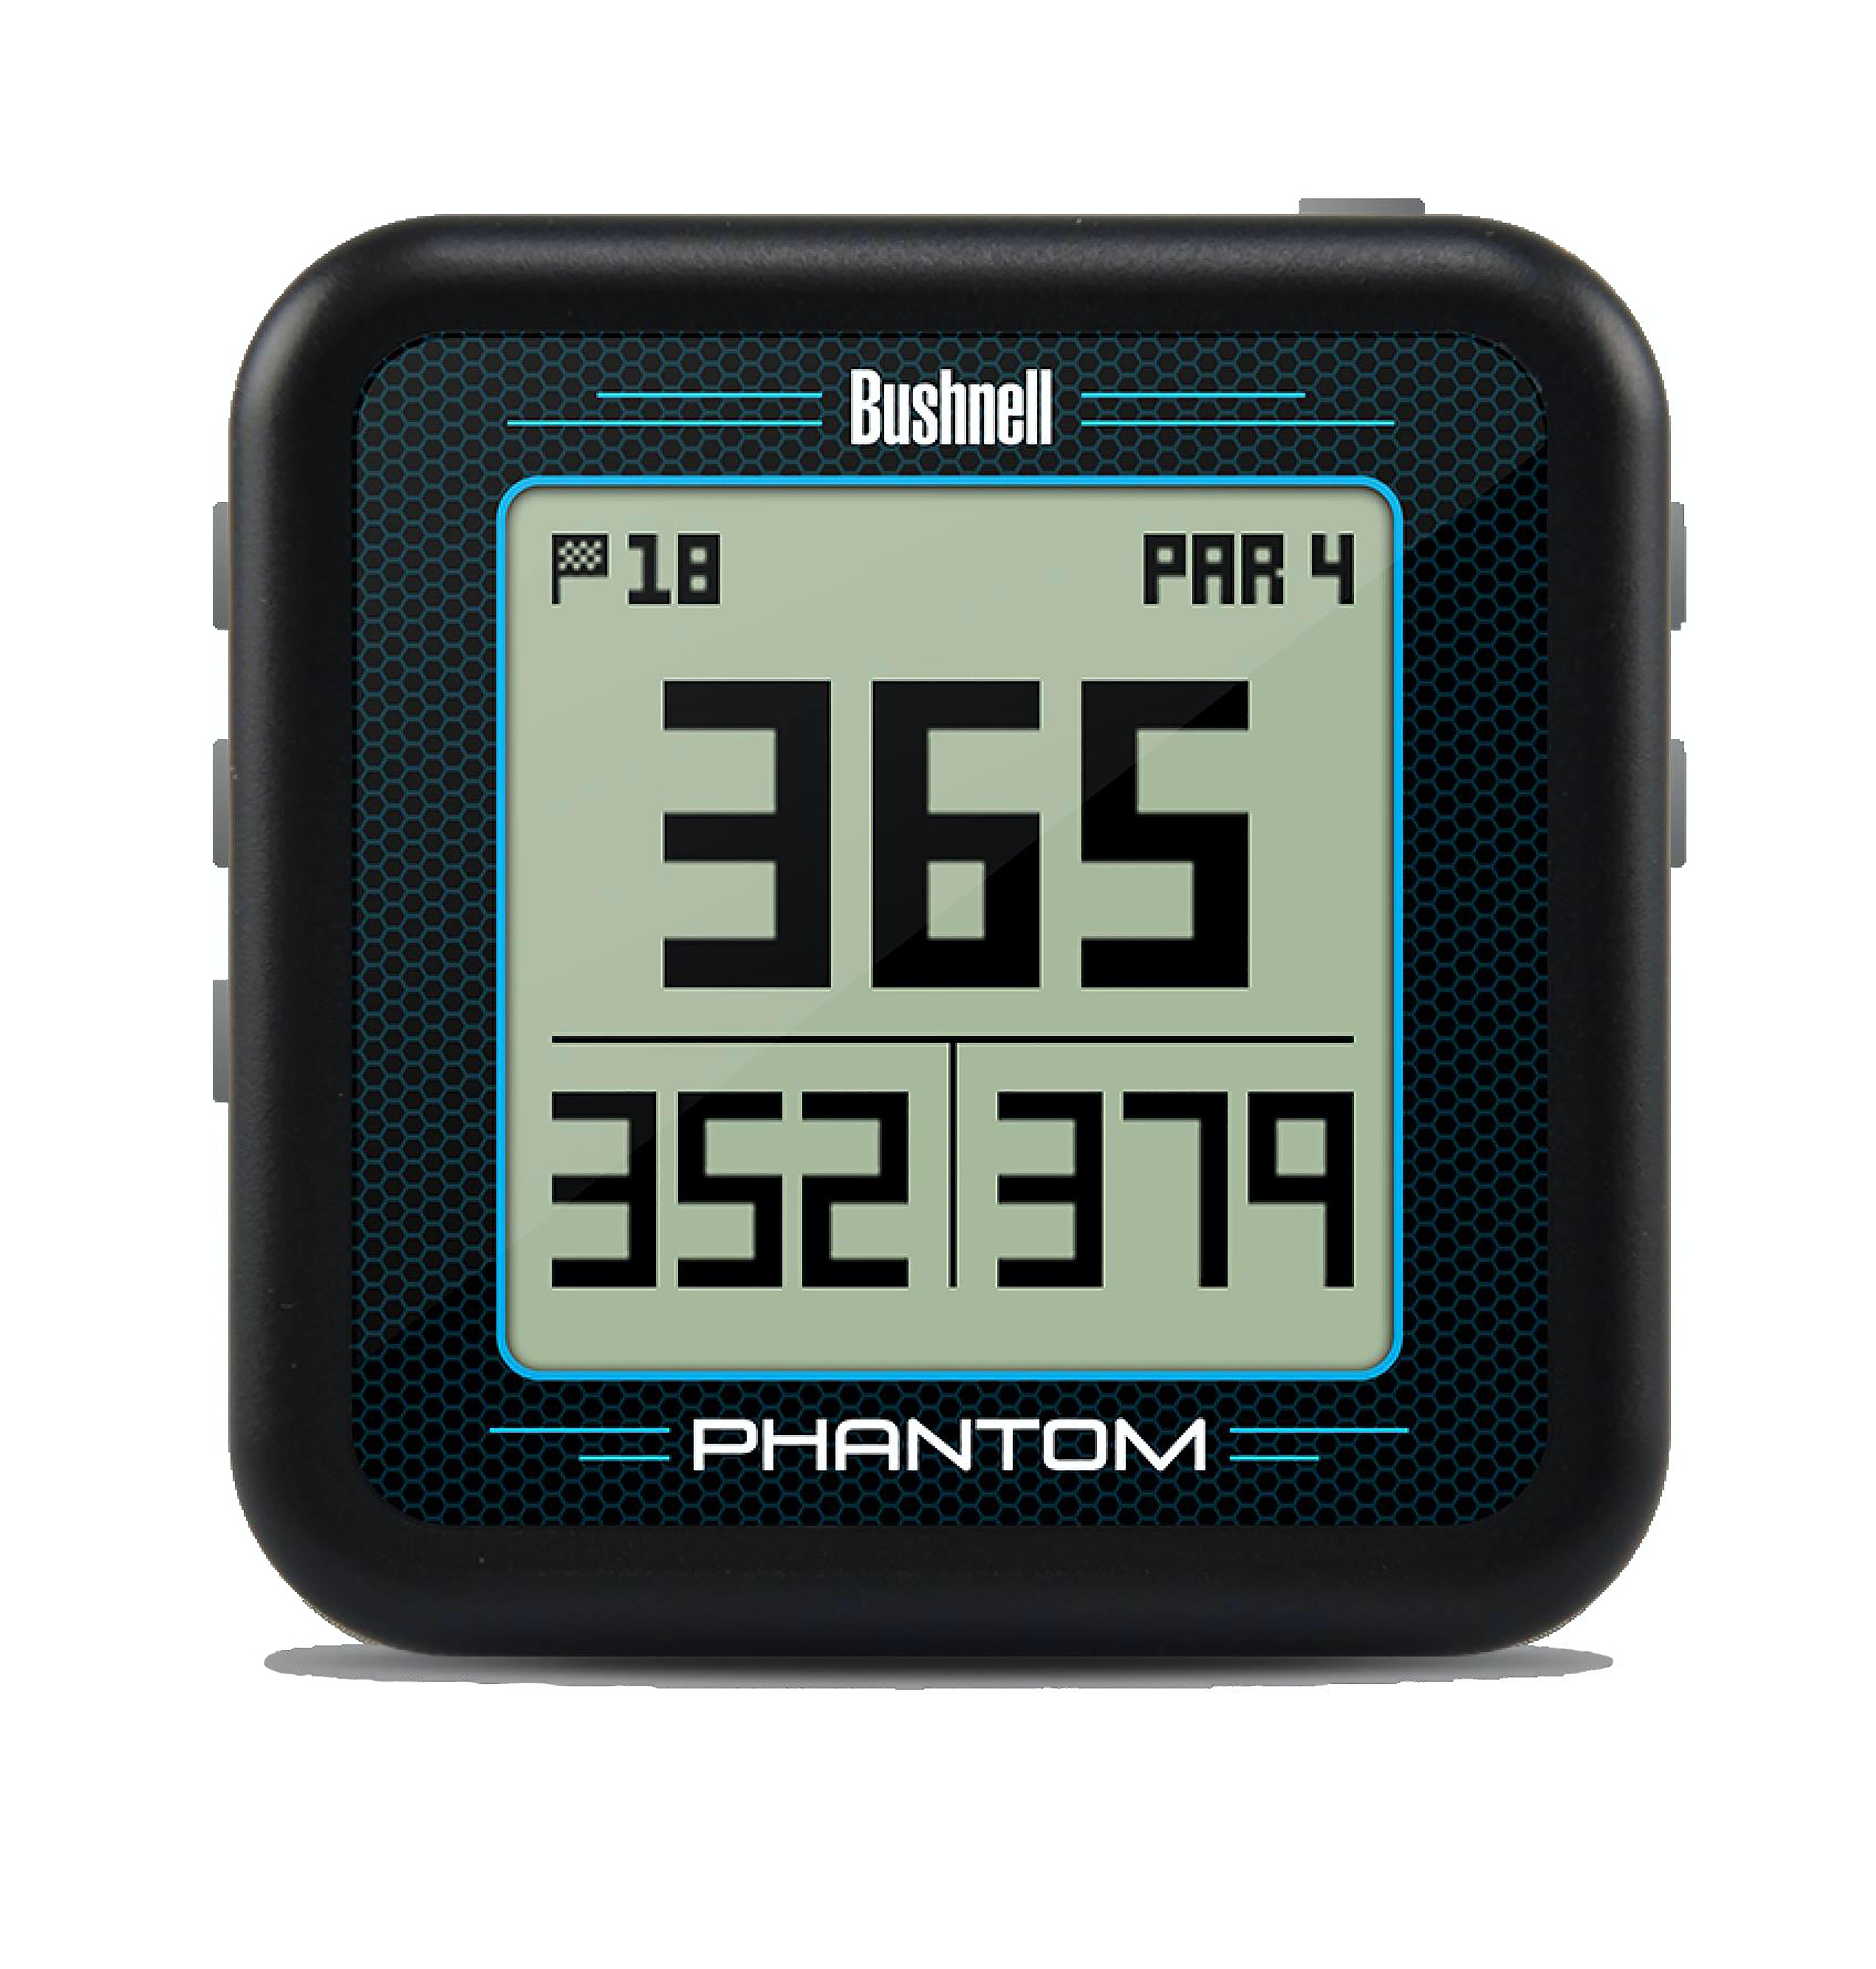 Bushnell Phantom GPS/Range Finder - Black